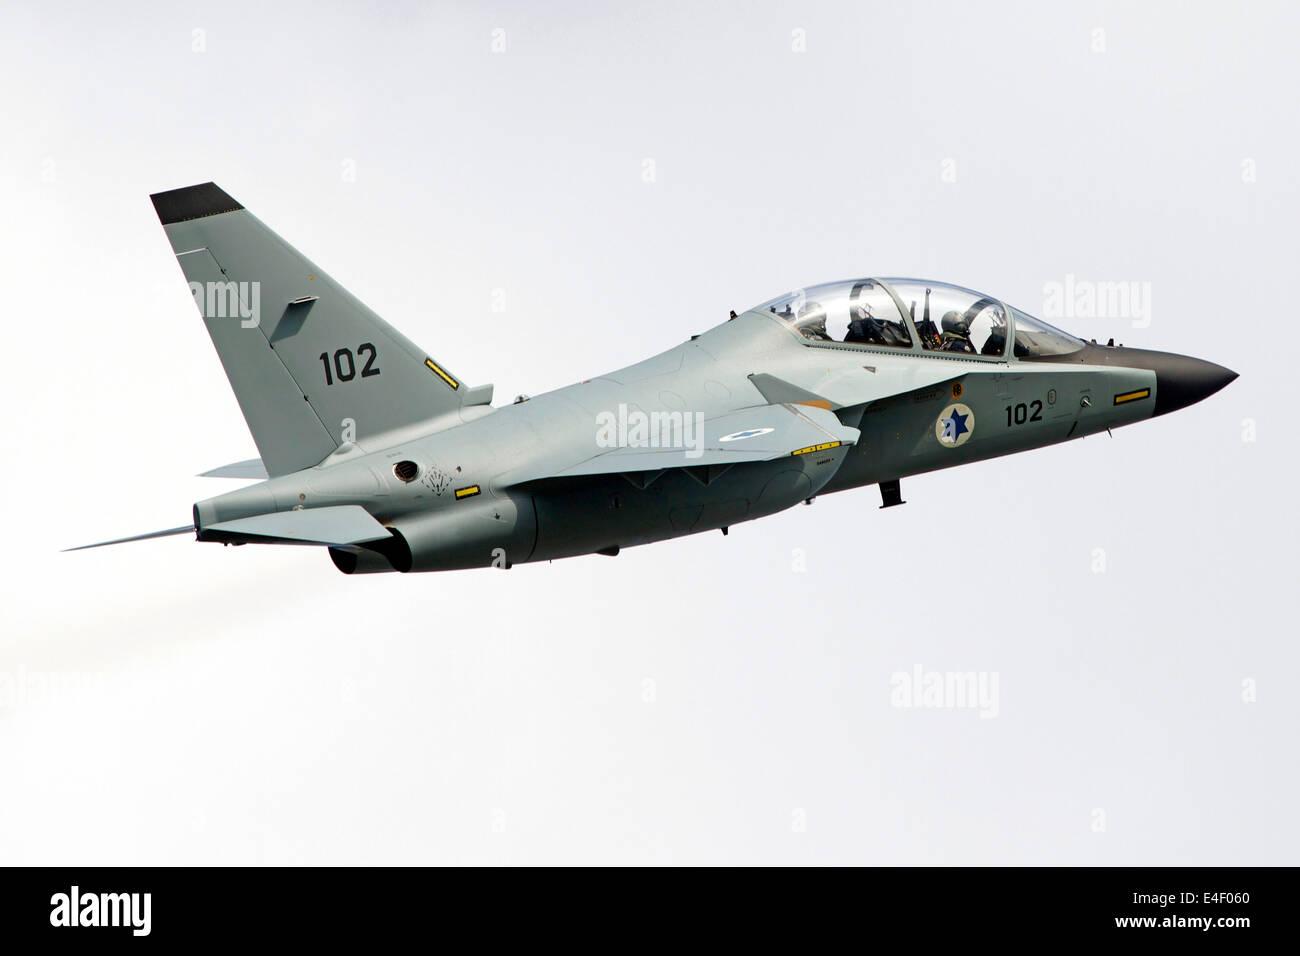 M-346 Fleet is Grounded Pending Crash Investigation | Defense News ...